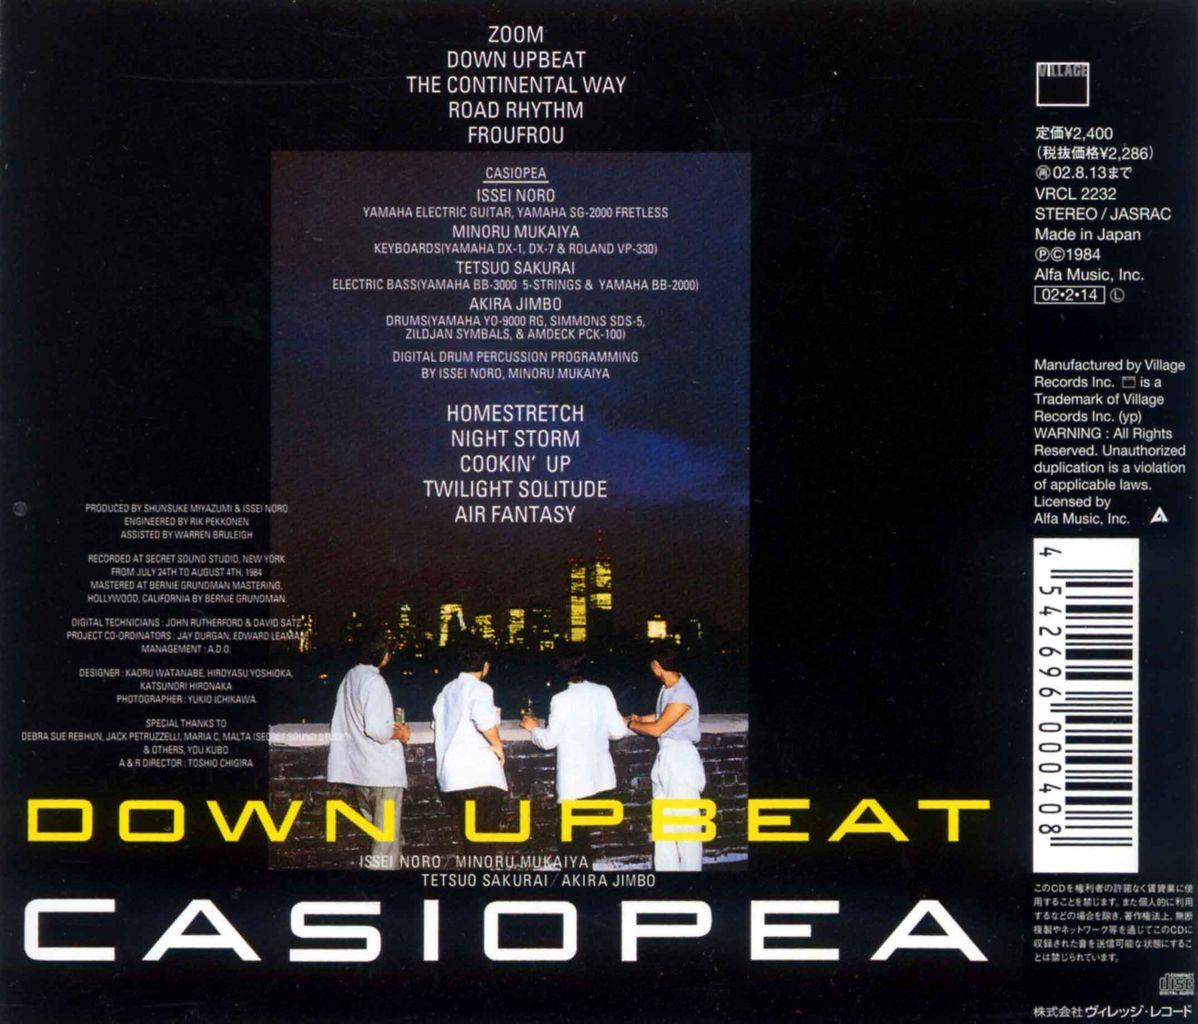 DOWN UPBEAT-2